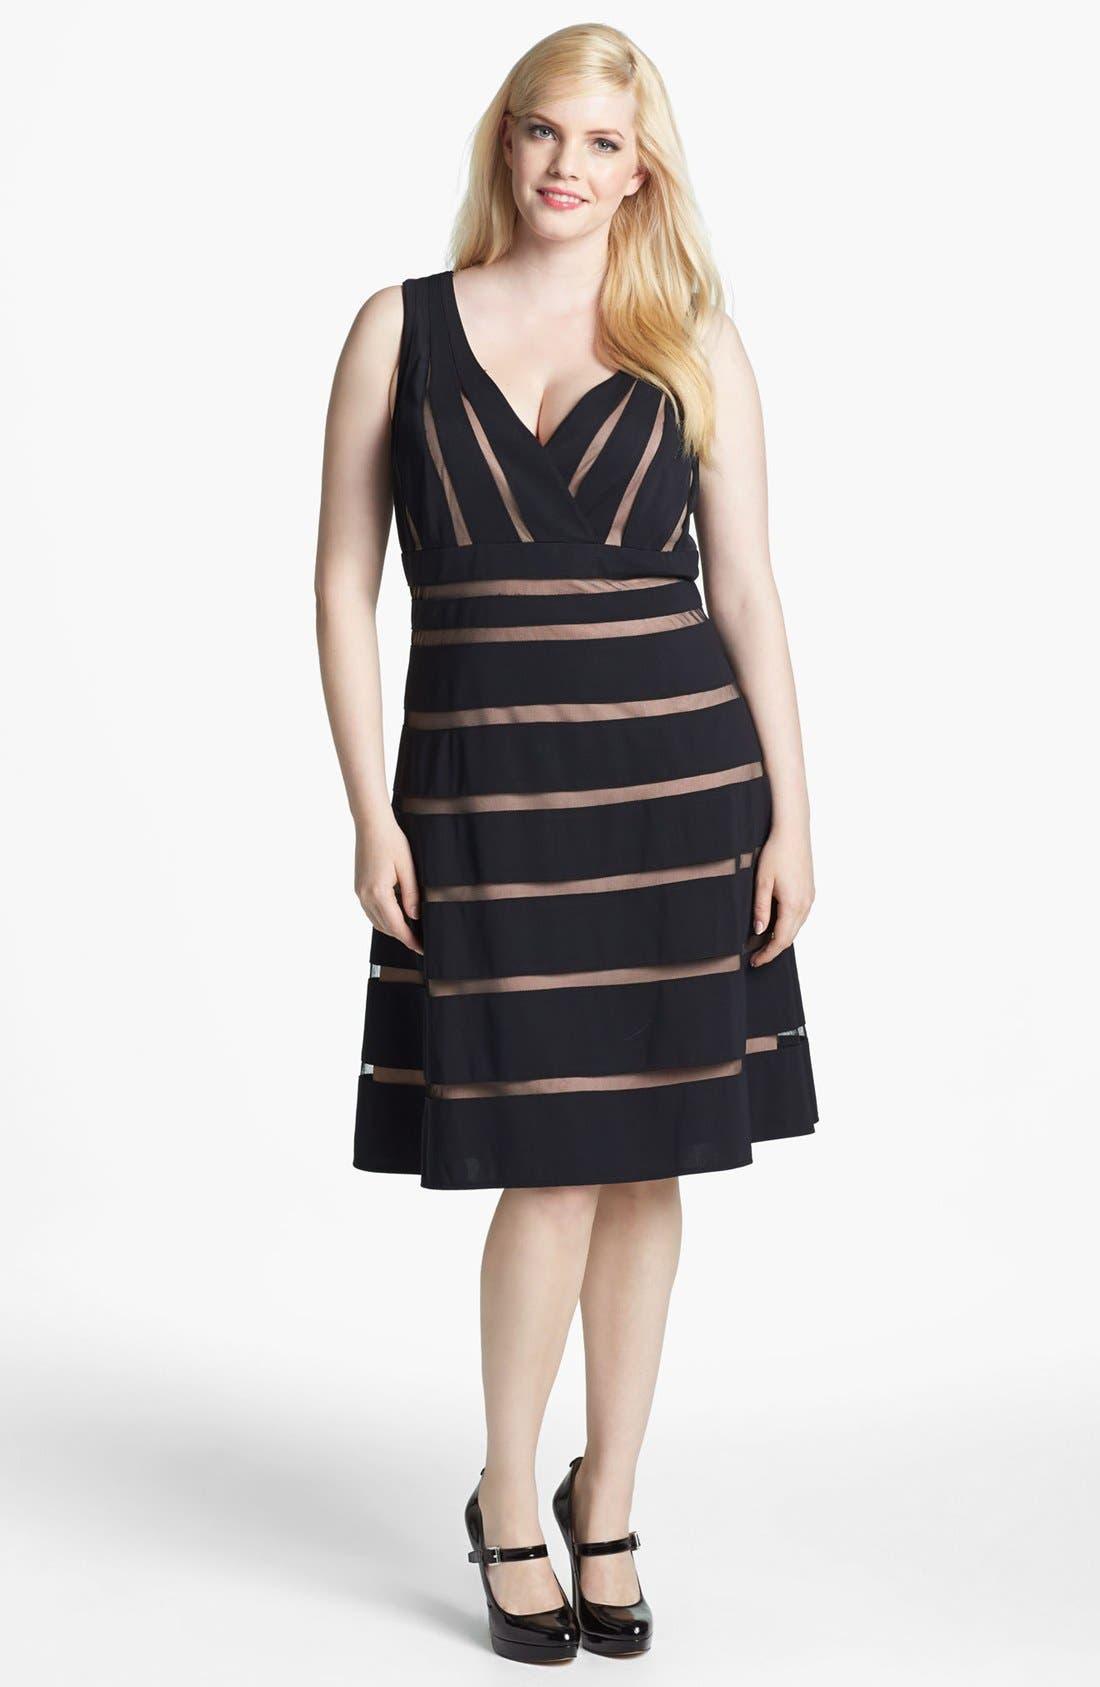 Alternate Image 1 Selected - Xscape Mesh Stripe Fit & Flare Dress (Plus Size)